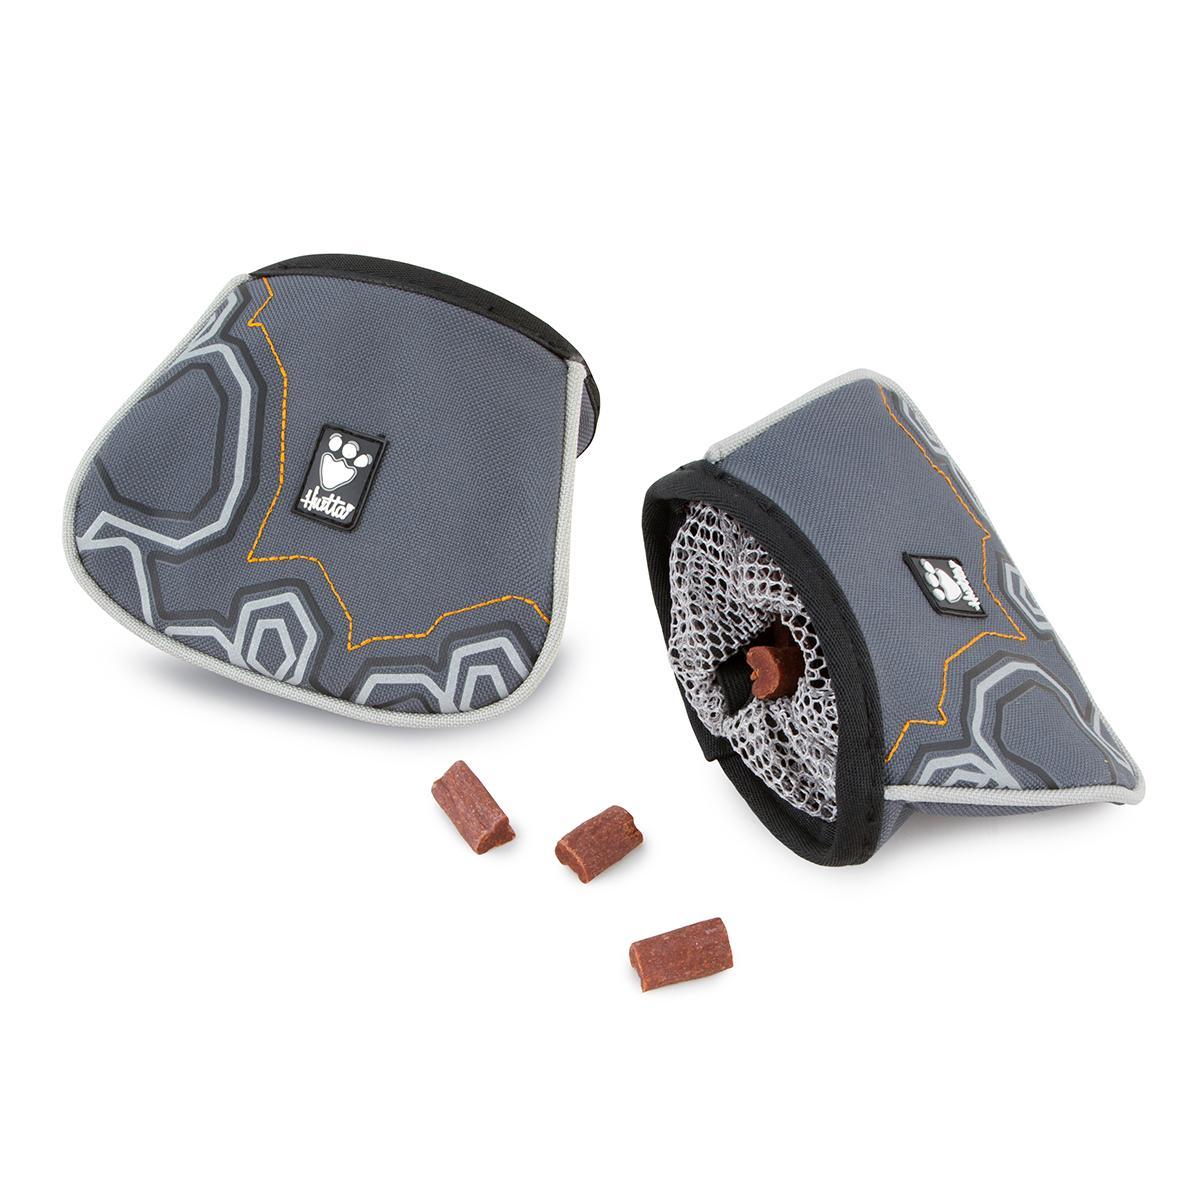 Hurtta Trick Pocket Treat Bag - Granite Gray